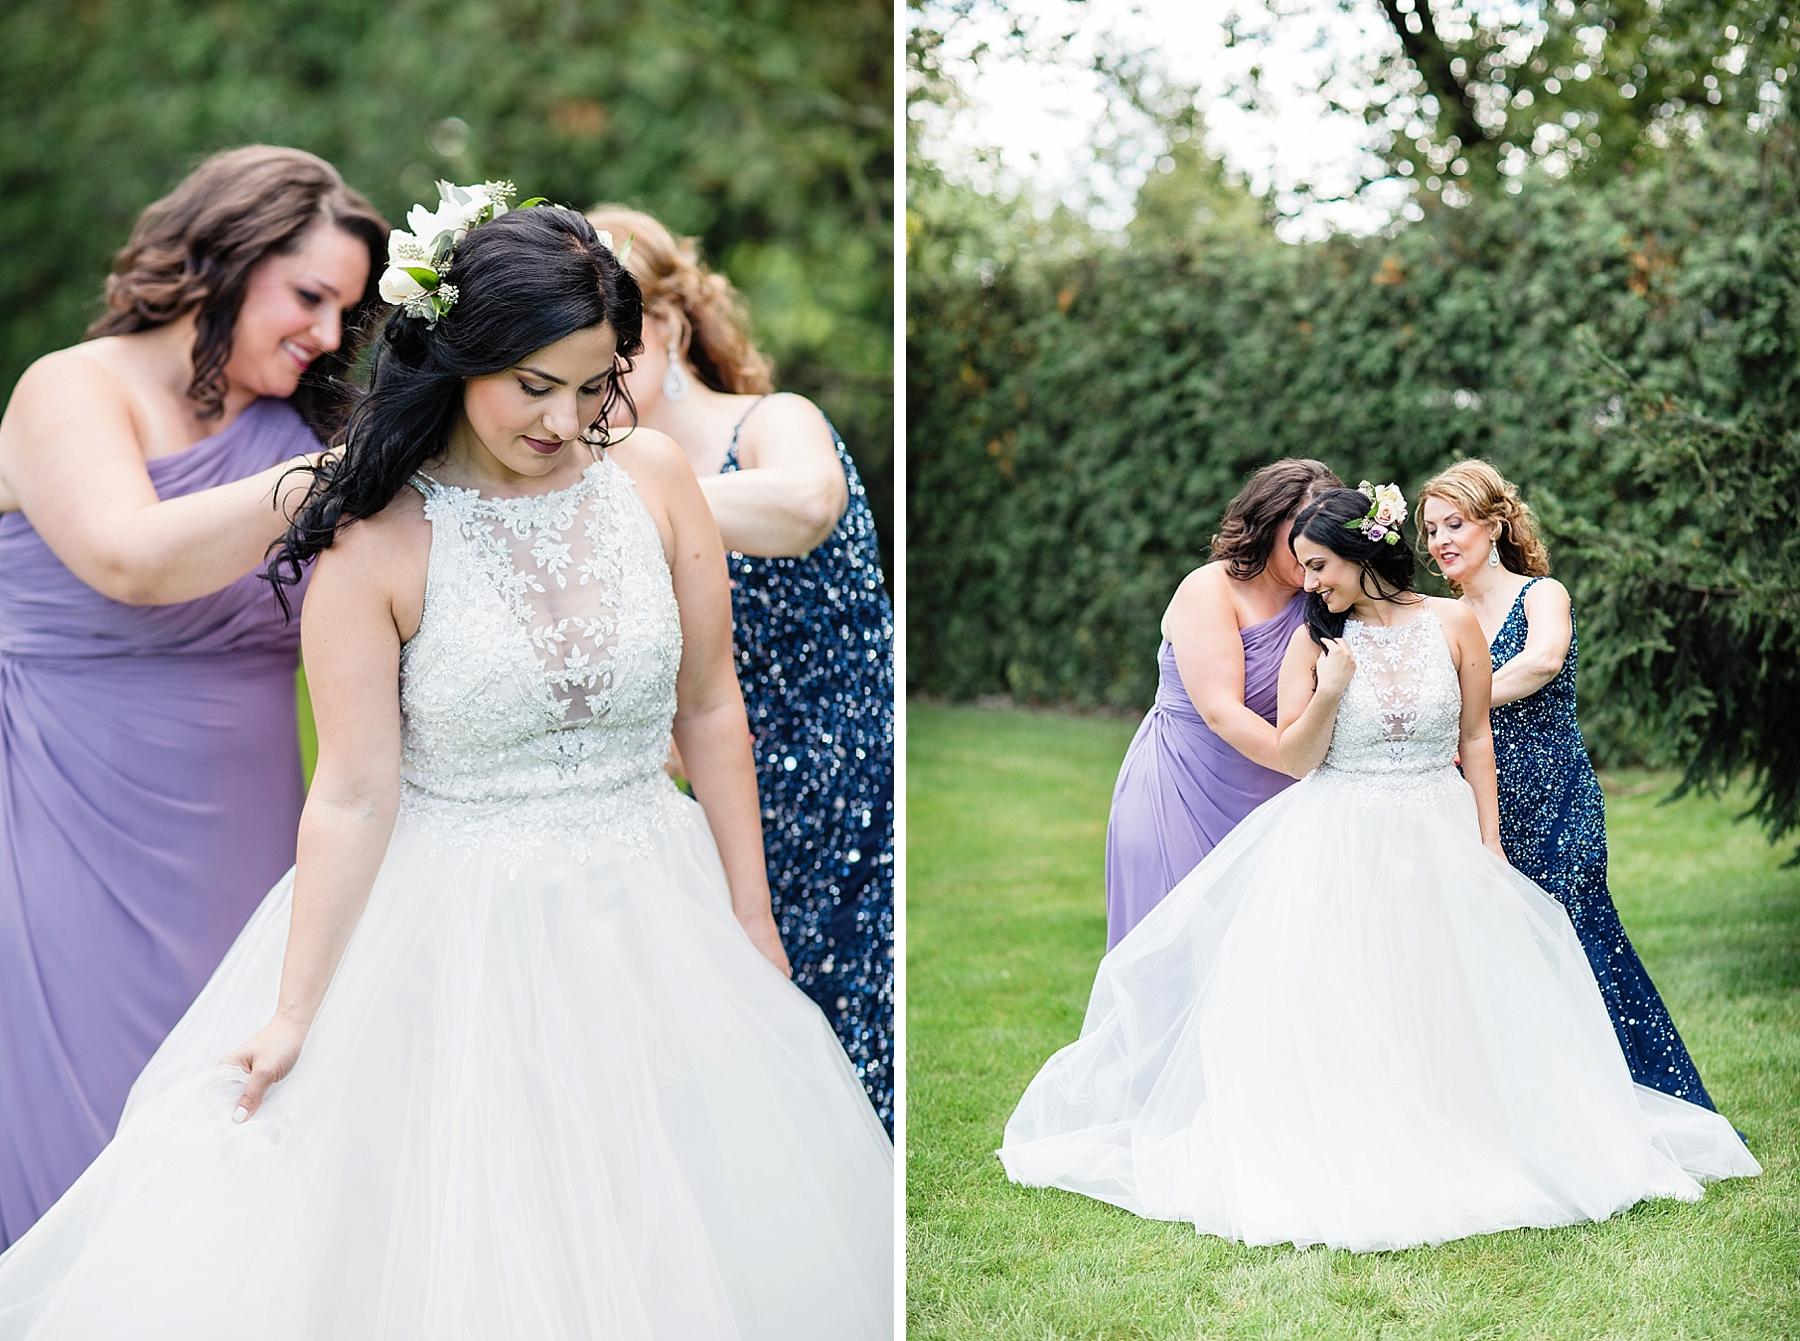 windsor-wedding-photographer-sprucewood-shores-winery-wedding-niagara-on-the-lake-wedding-photographer-eryn-shea-photography_0012.jpg